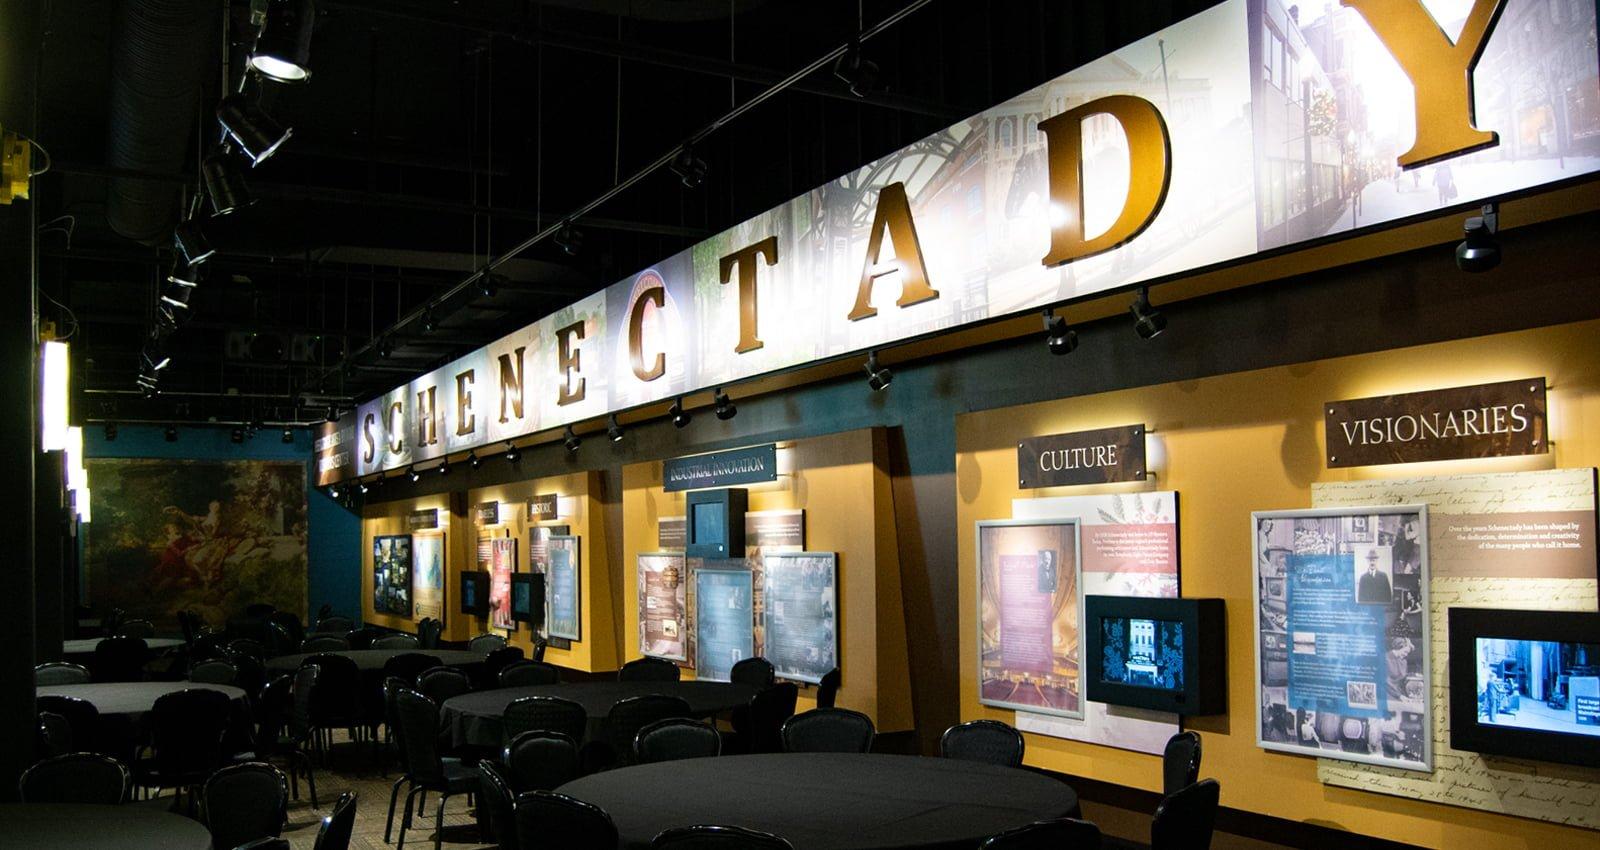 AFrey_Capital-Saratoga Region - Proctors Theatre, Schenectady Heritage Visitors Center